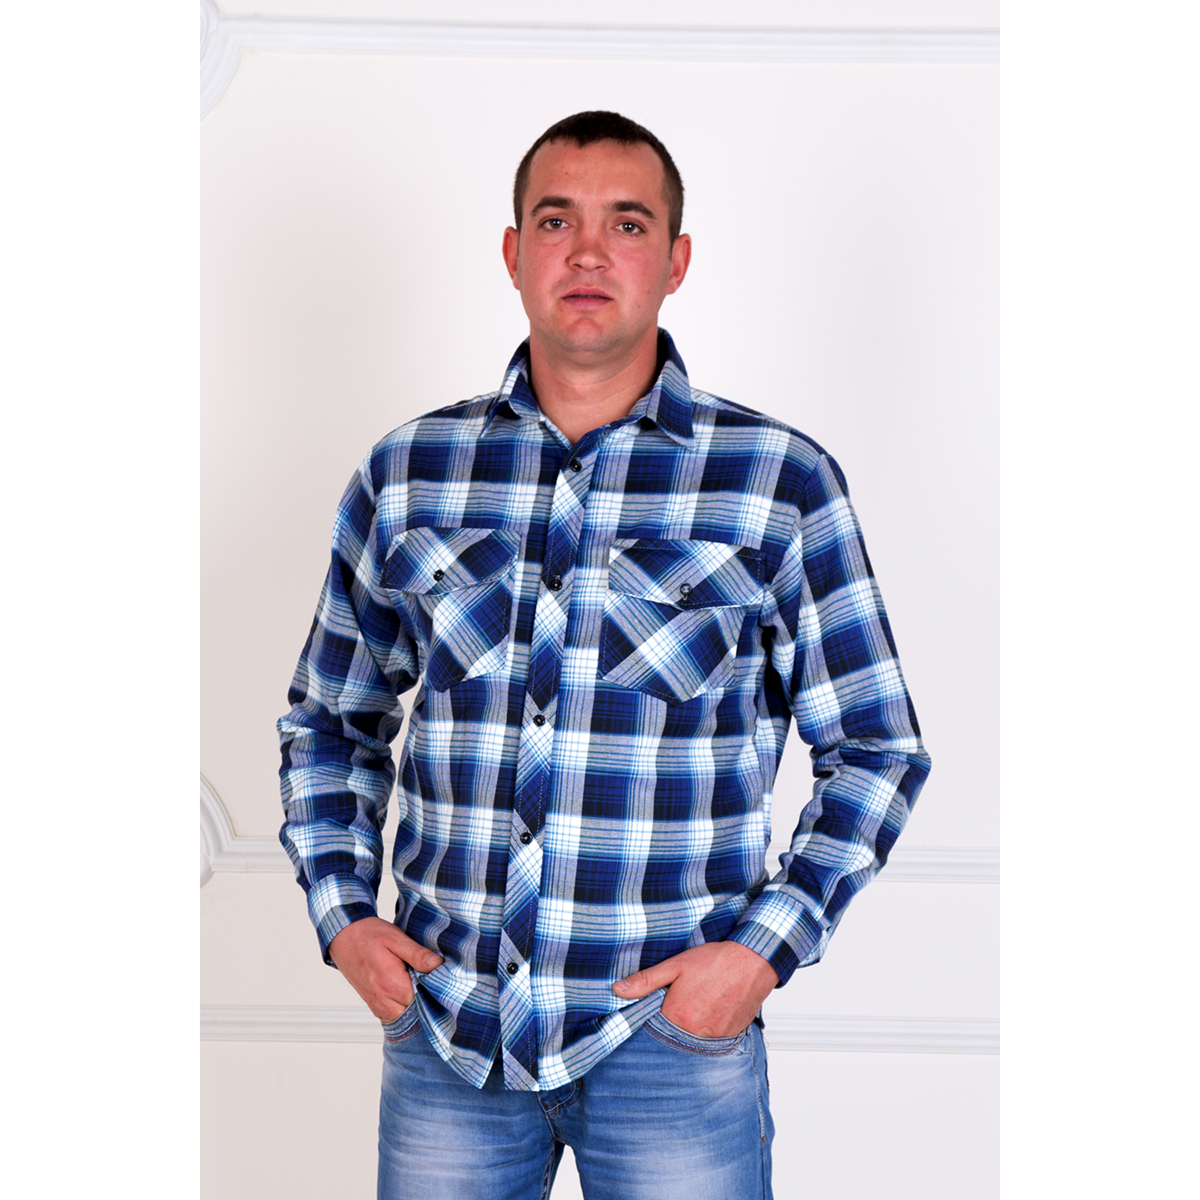 Мужская рубашка Леонард, размер 50Толстовки, джемпера и рубашки<br>Обхват груди:100 см<br>Обхват талии:92 см<br>Обхват бедер:106 см<br>Обхват шеи, ворот:41 см<br>Рост:176-182 см<br><br>Тип: Муж. рубашка<br>Размер: 50<br>Материал: Фуле